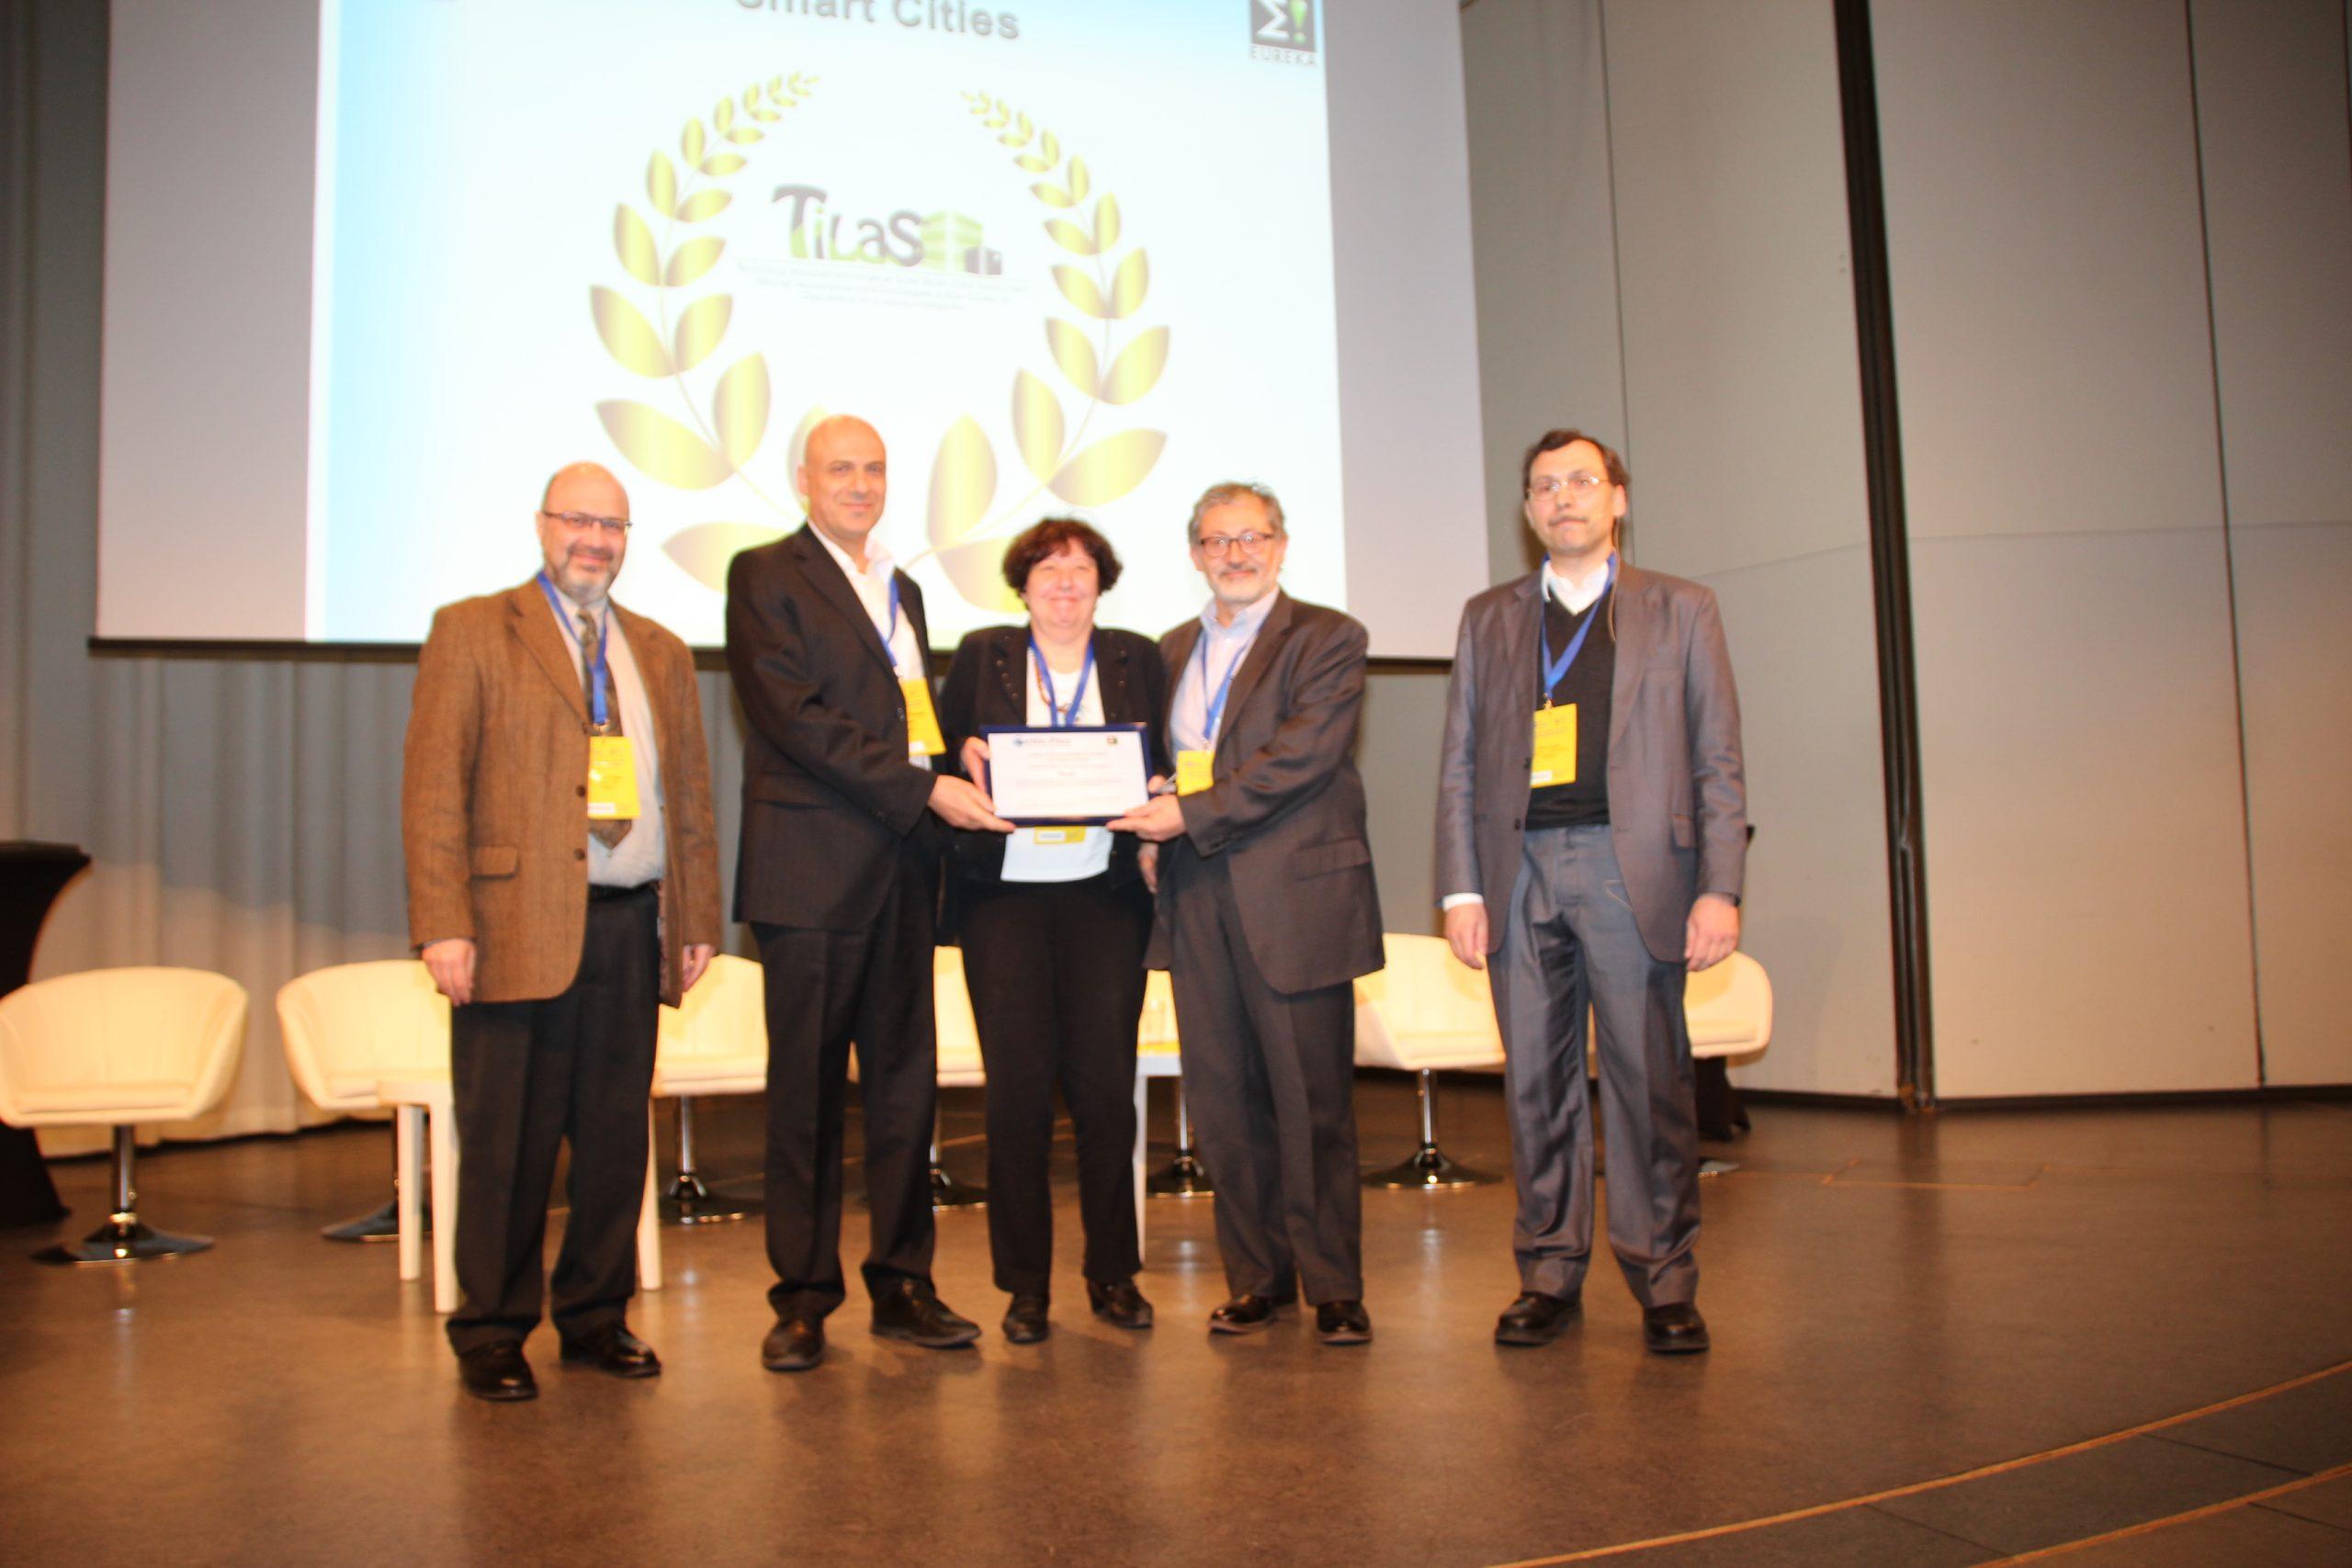 Celtic-Plus Samrt Cities Award